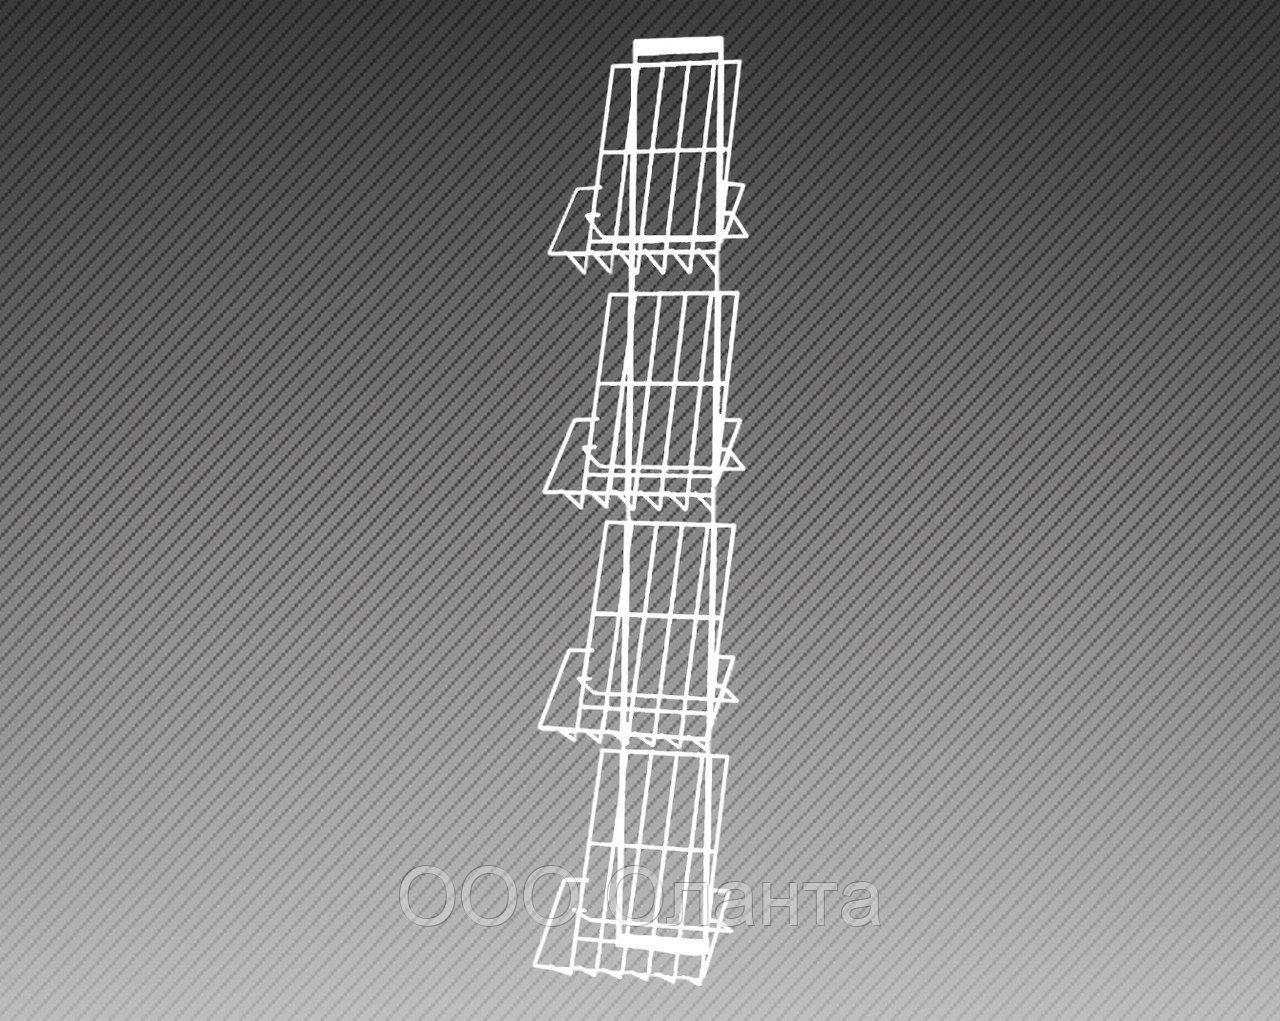 Полоса настенная для прайс-листов на 4 лотка формат А4 арт. СБС3-4Л